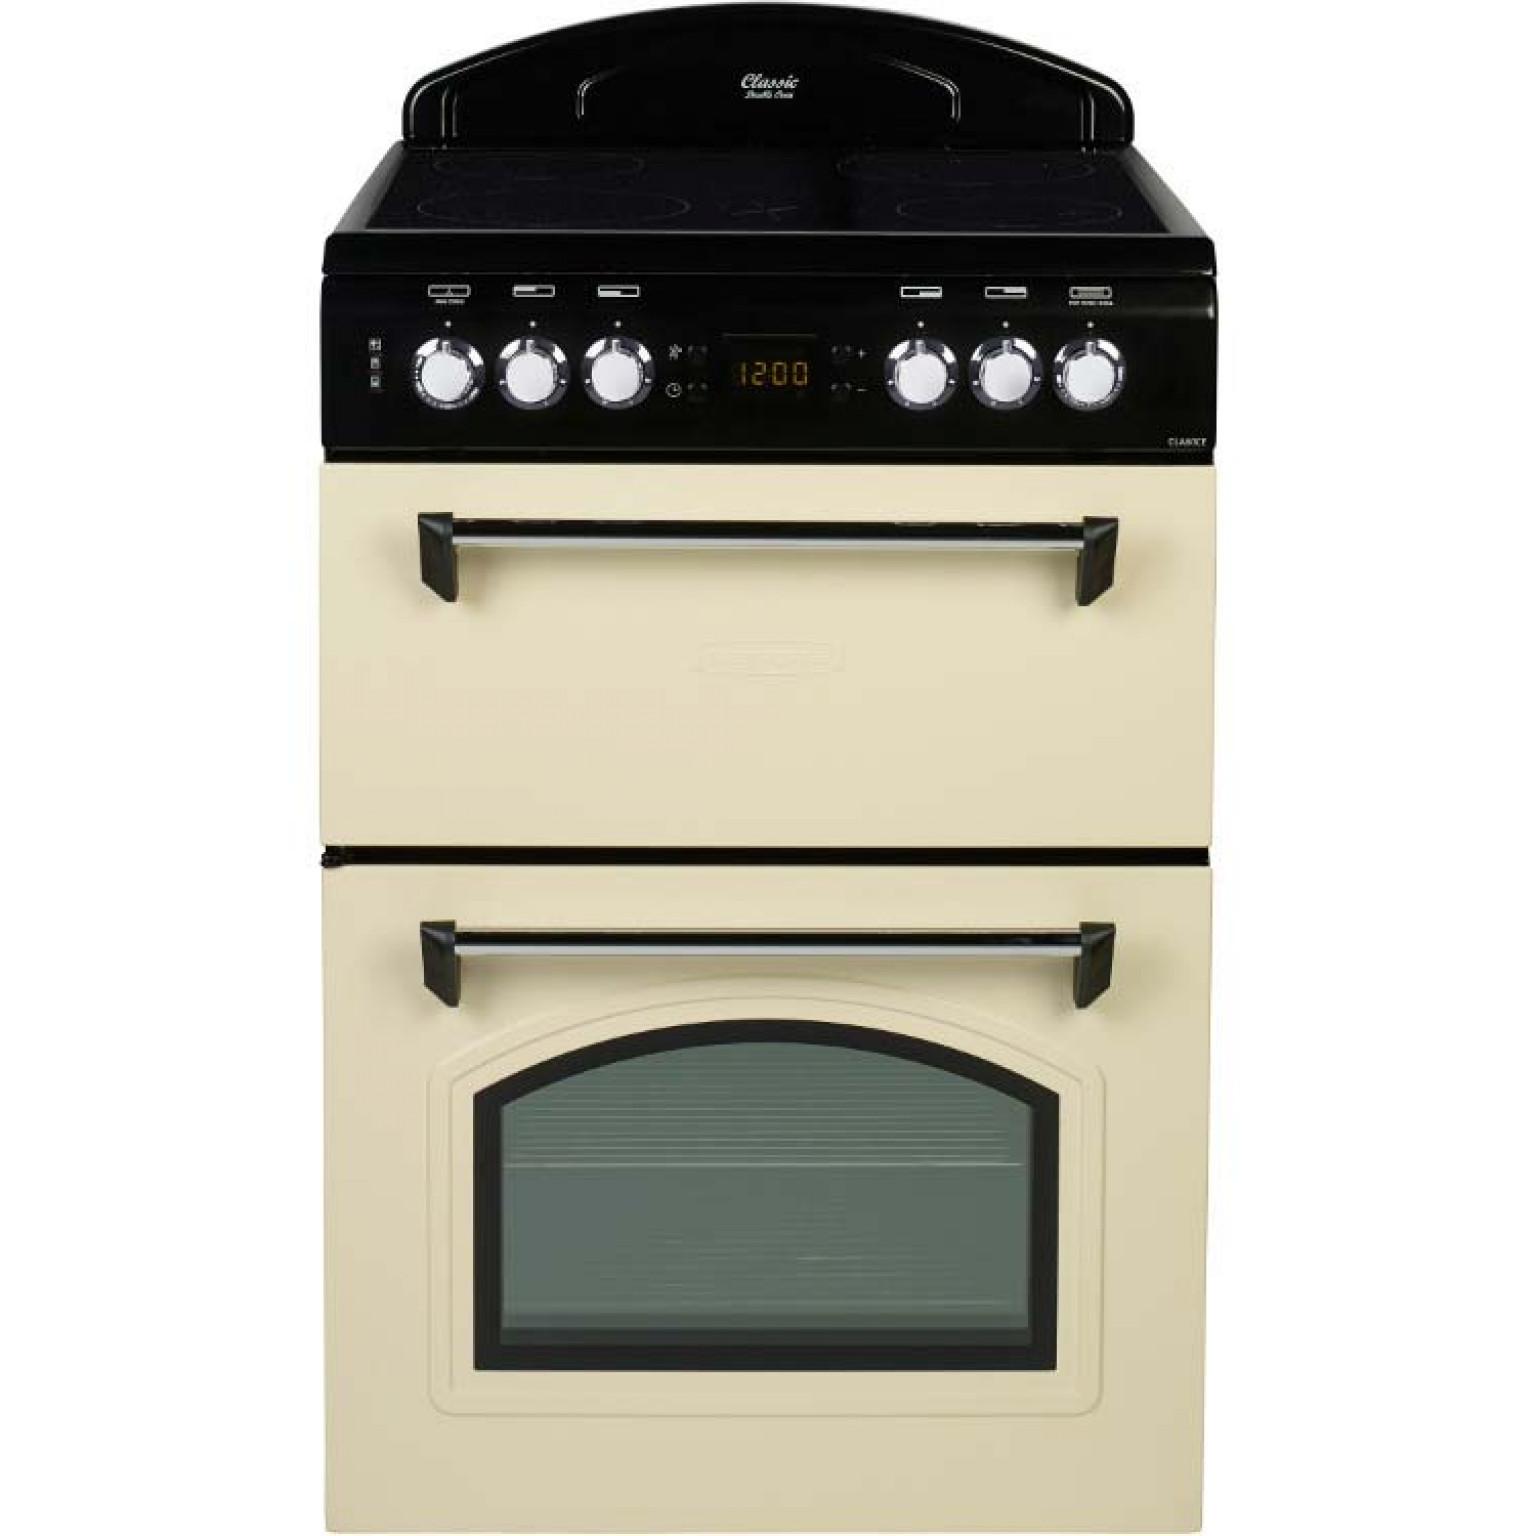 Leisure 60cm Classic Range Cooker | CLA60CEC